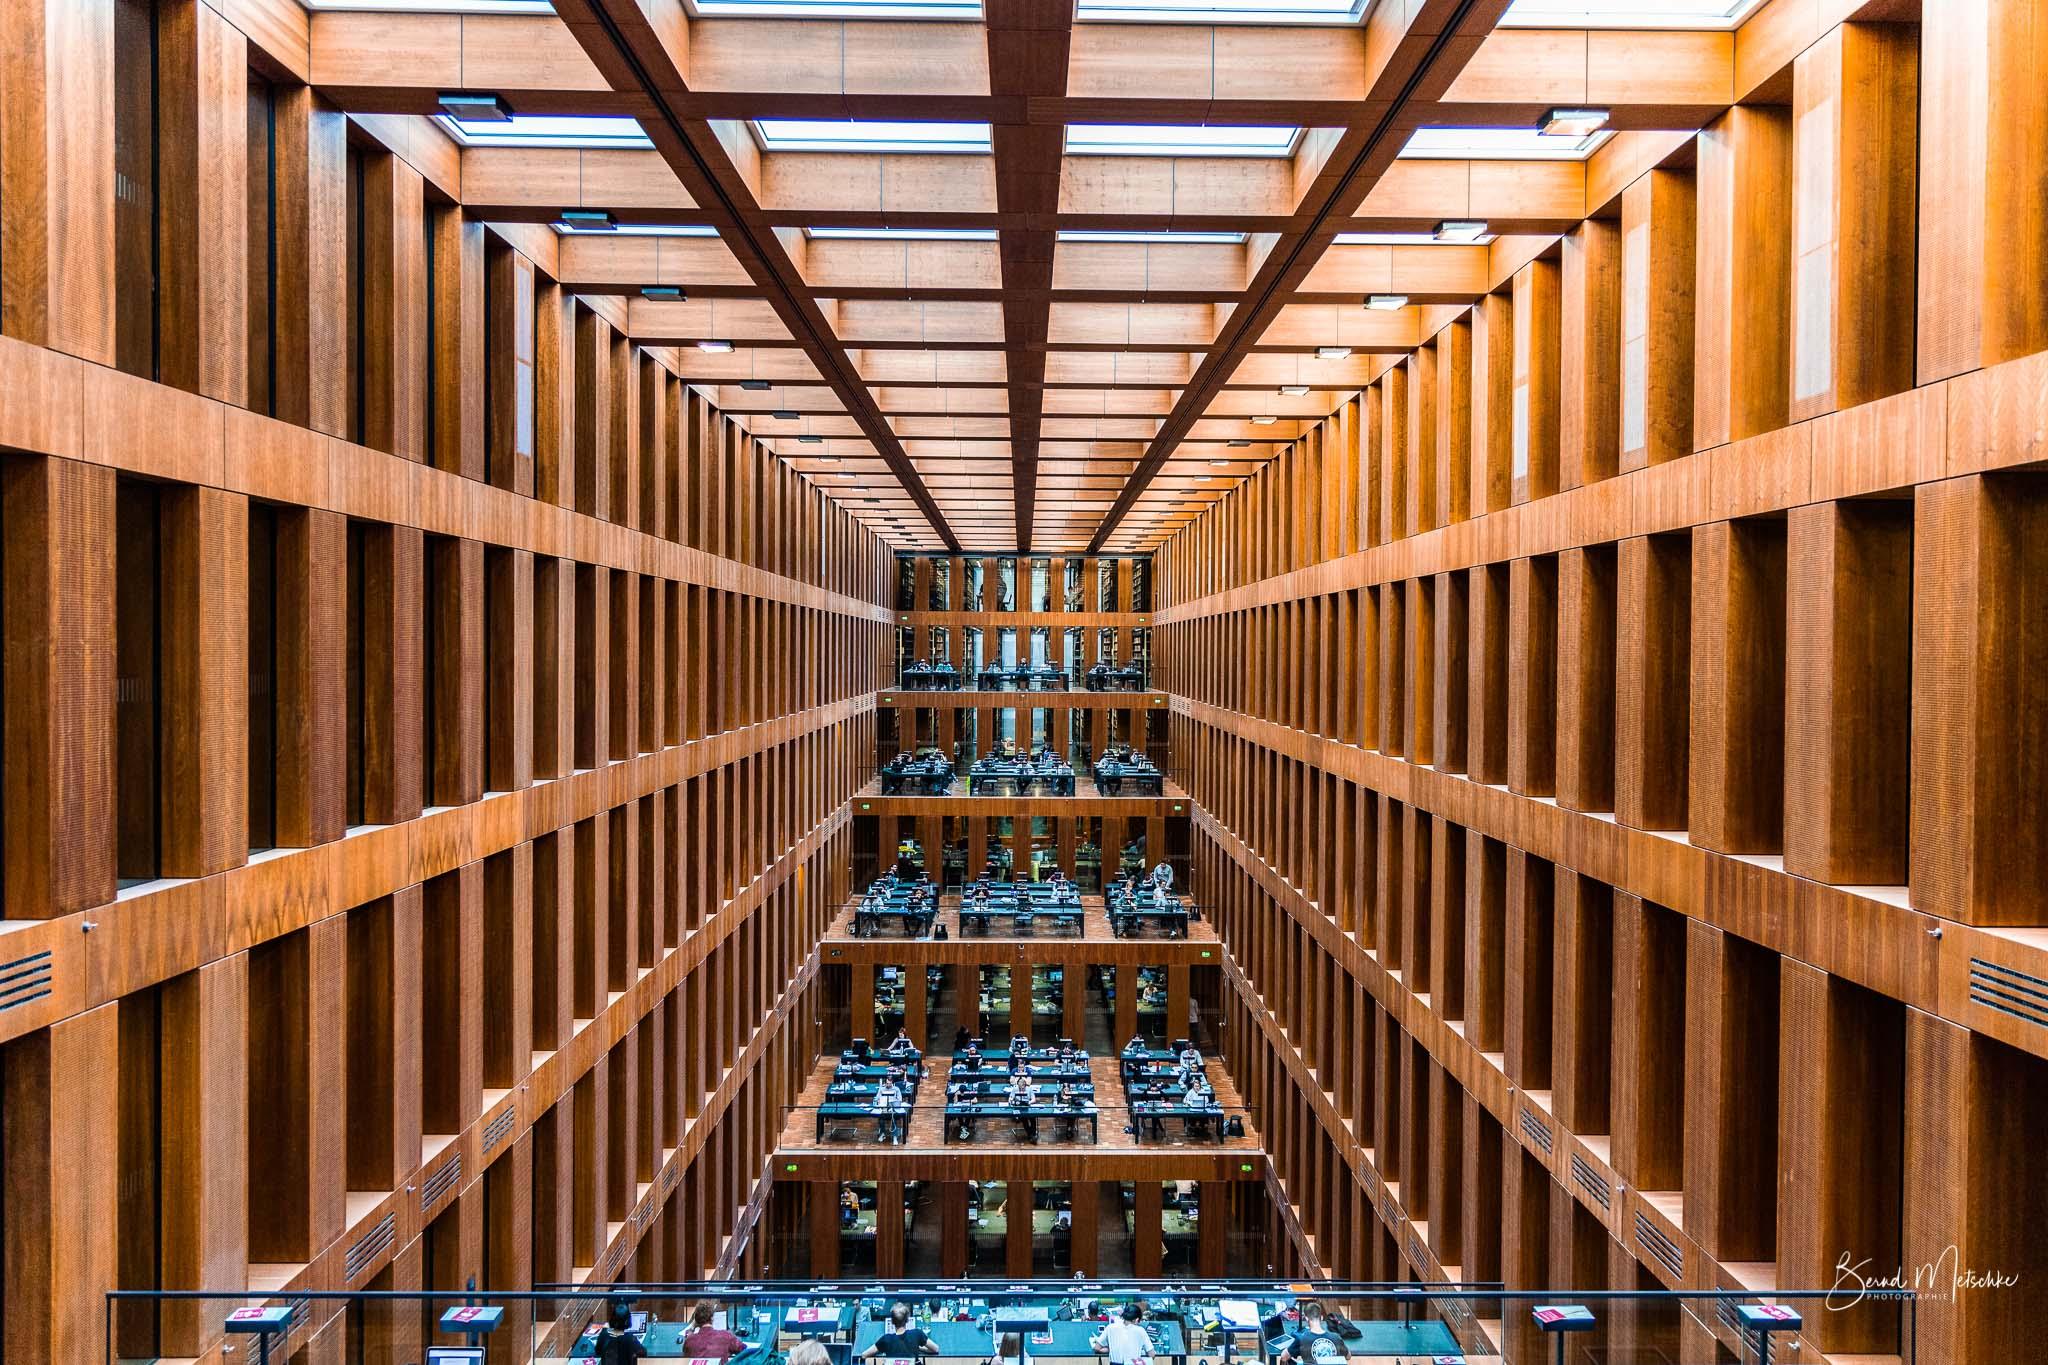 Humboldt-Universität